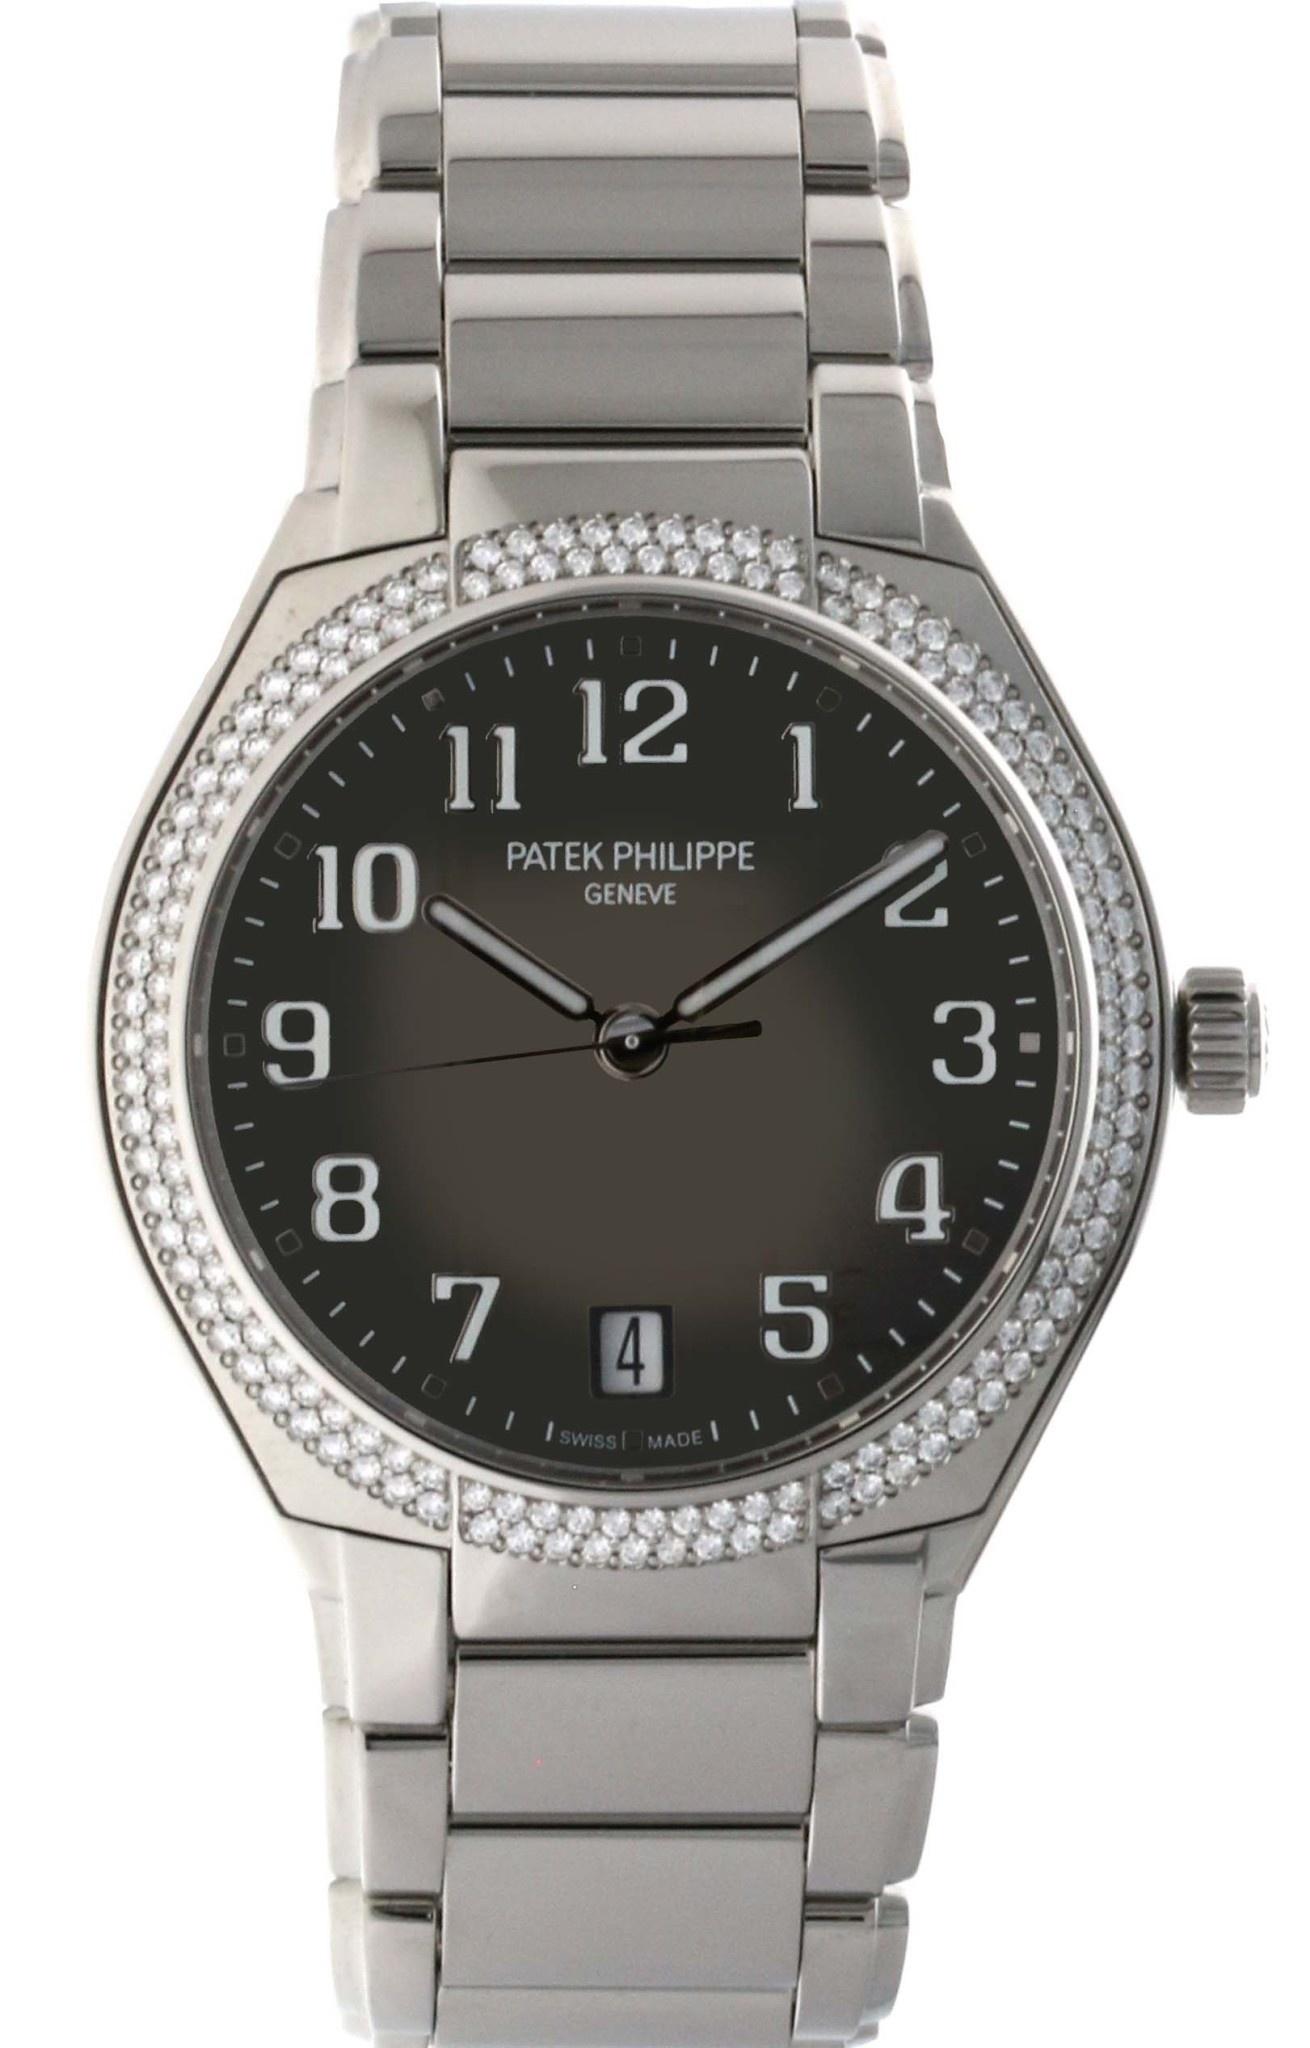 Buy a Watch Online